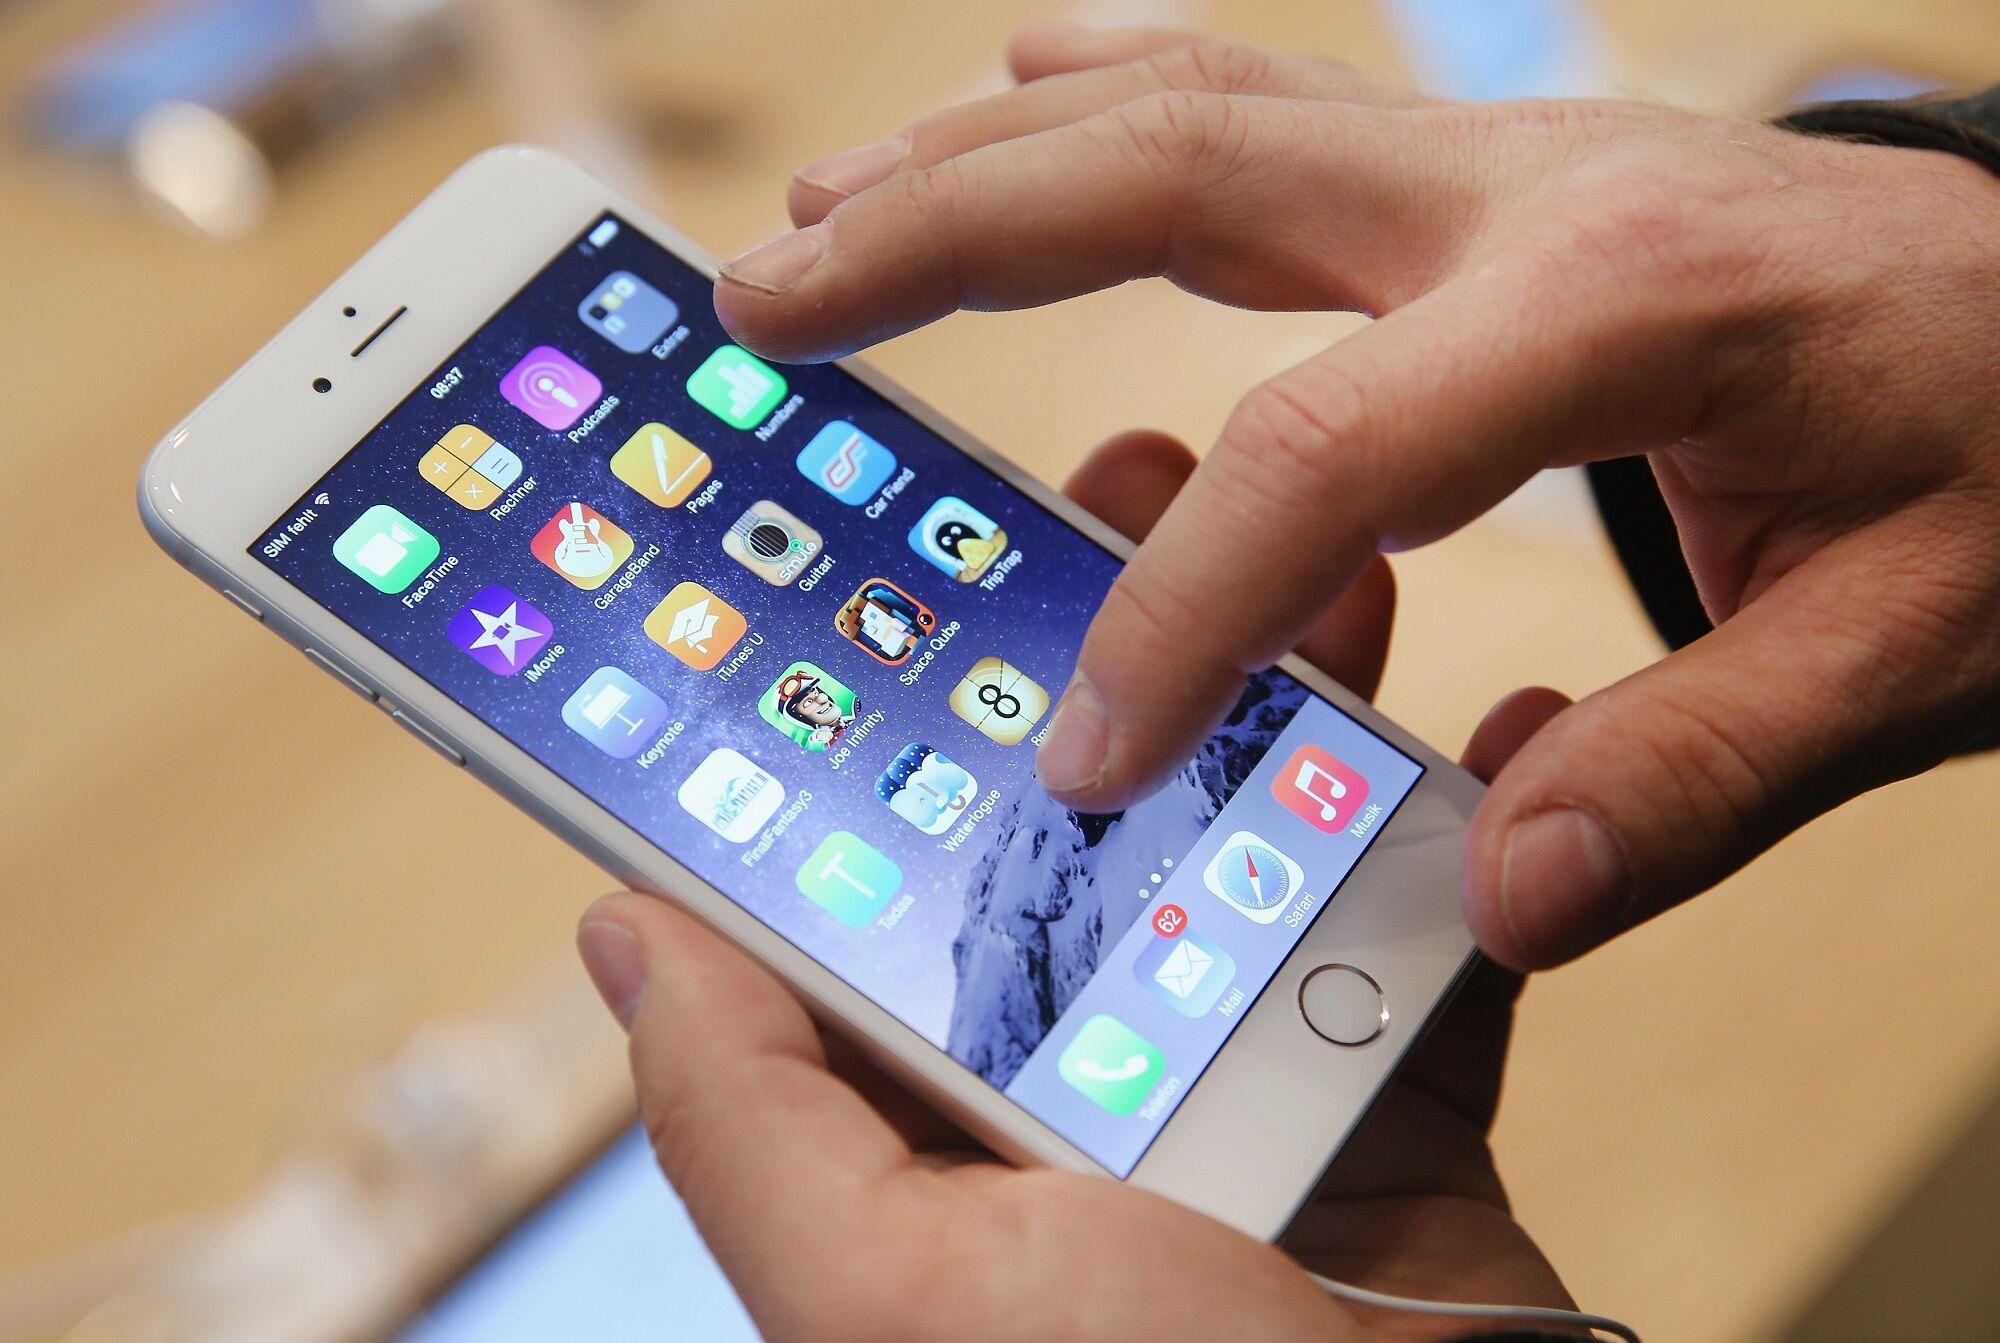 Hati-Hati Sebelum Hapus Cache! 5 Fakta Hapus Cache di Smartphone Ini Pasti Belum Kamu Ketahui